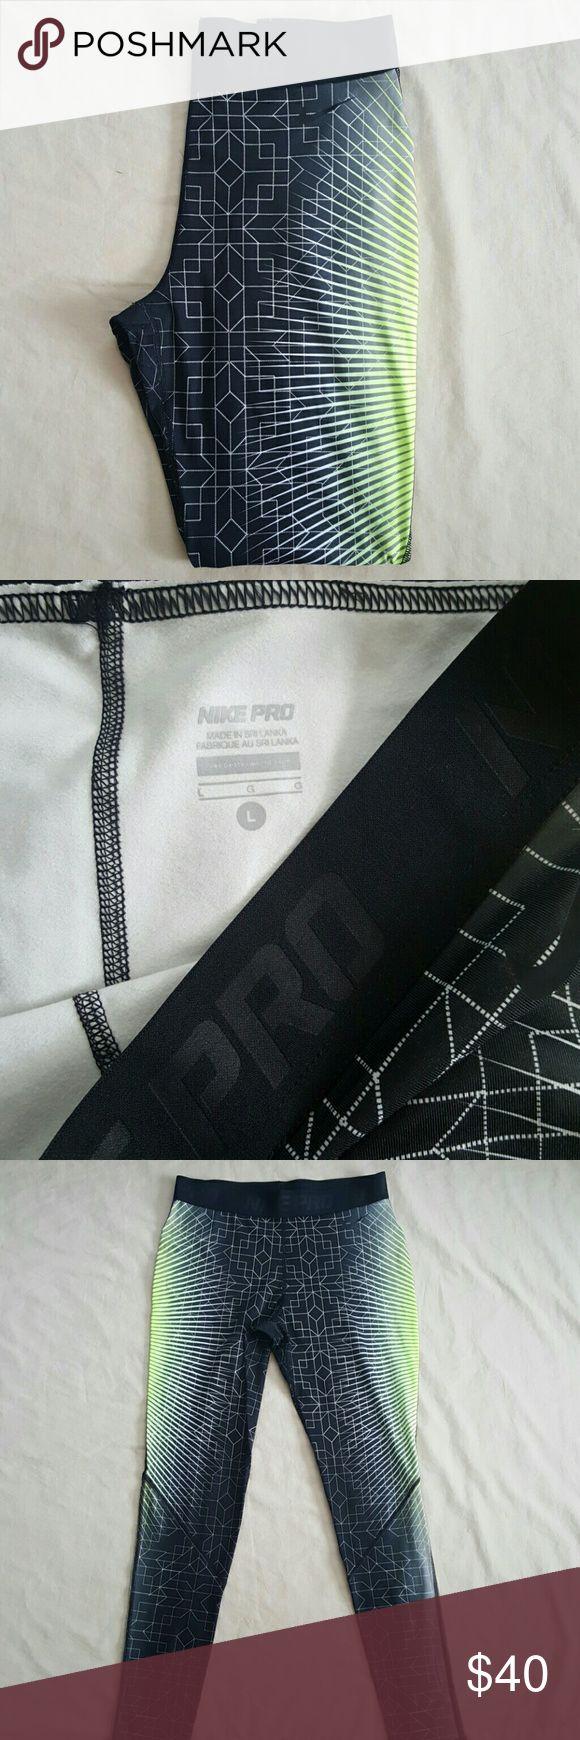 🌹🌹🌹Nike Pro 🌹🌹🌹full lenght running leggins Like new, no flaws, super soft linning on the inside. Nike Pants Track Pants & Joggers